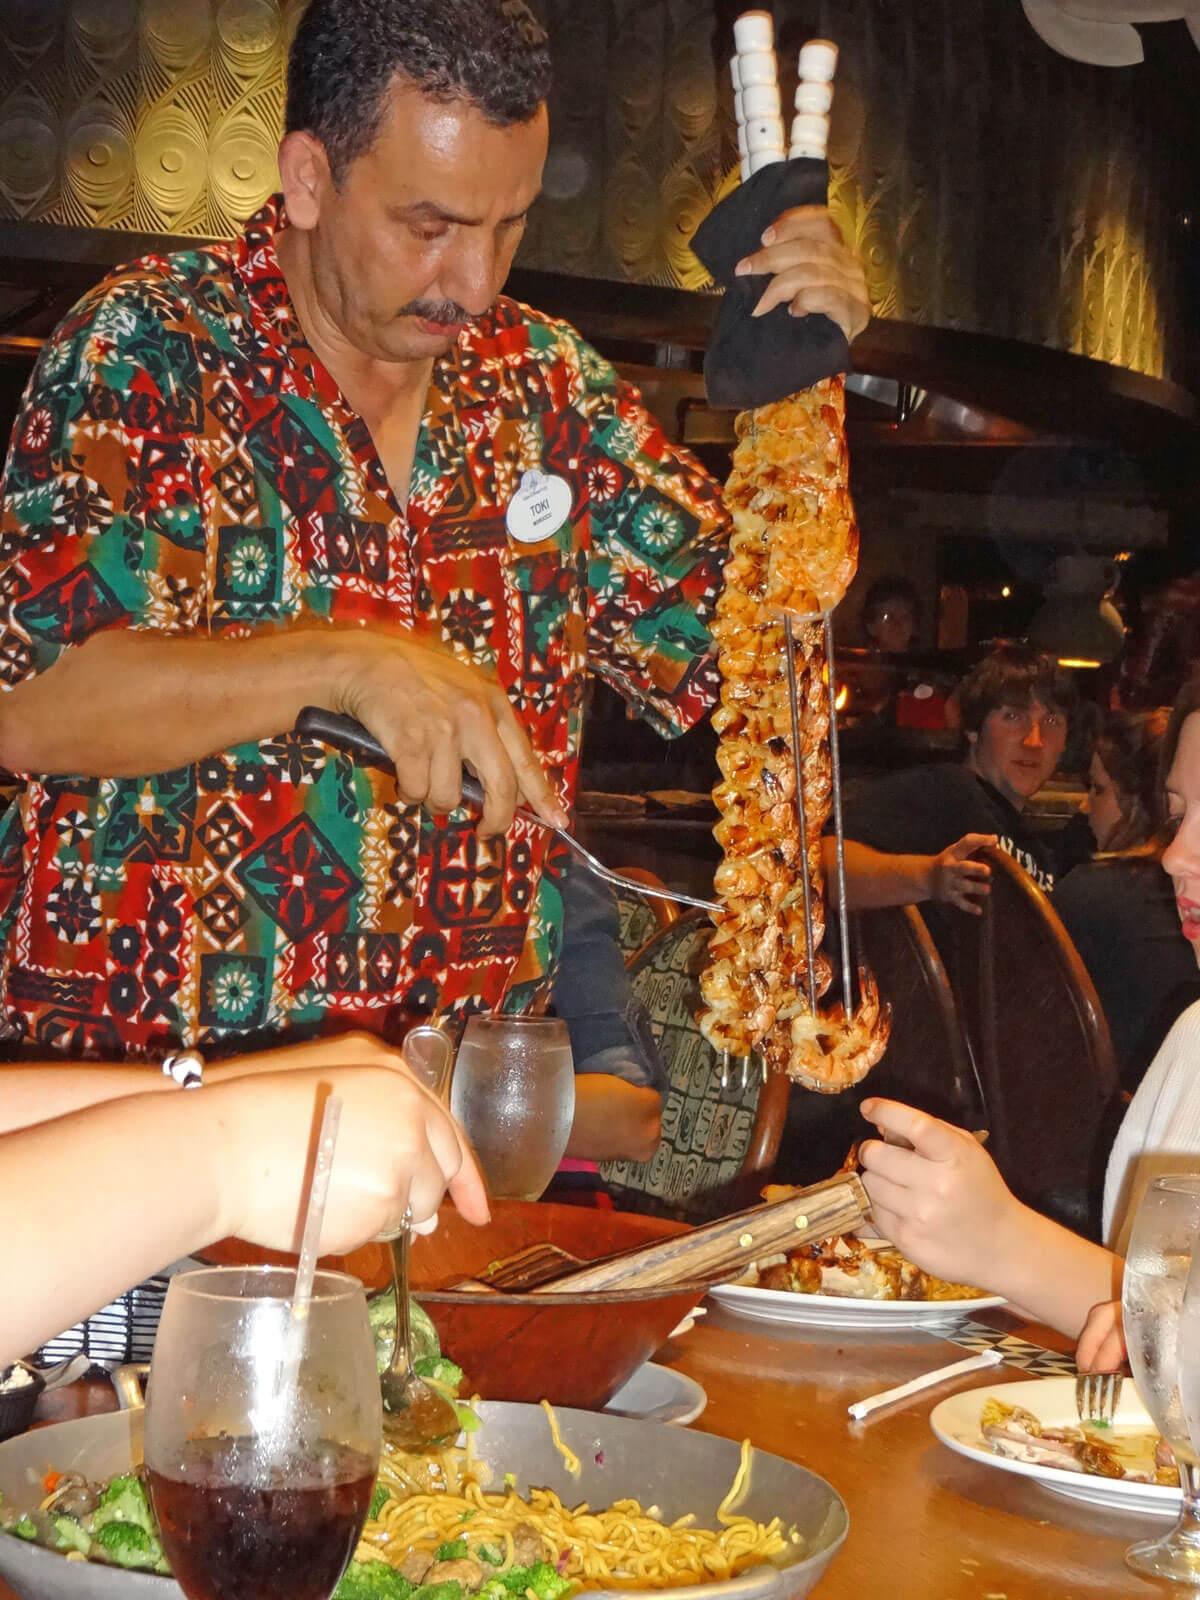 Top 5 Disney World Family Restaurants Undercover Tourist